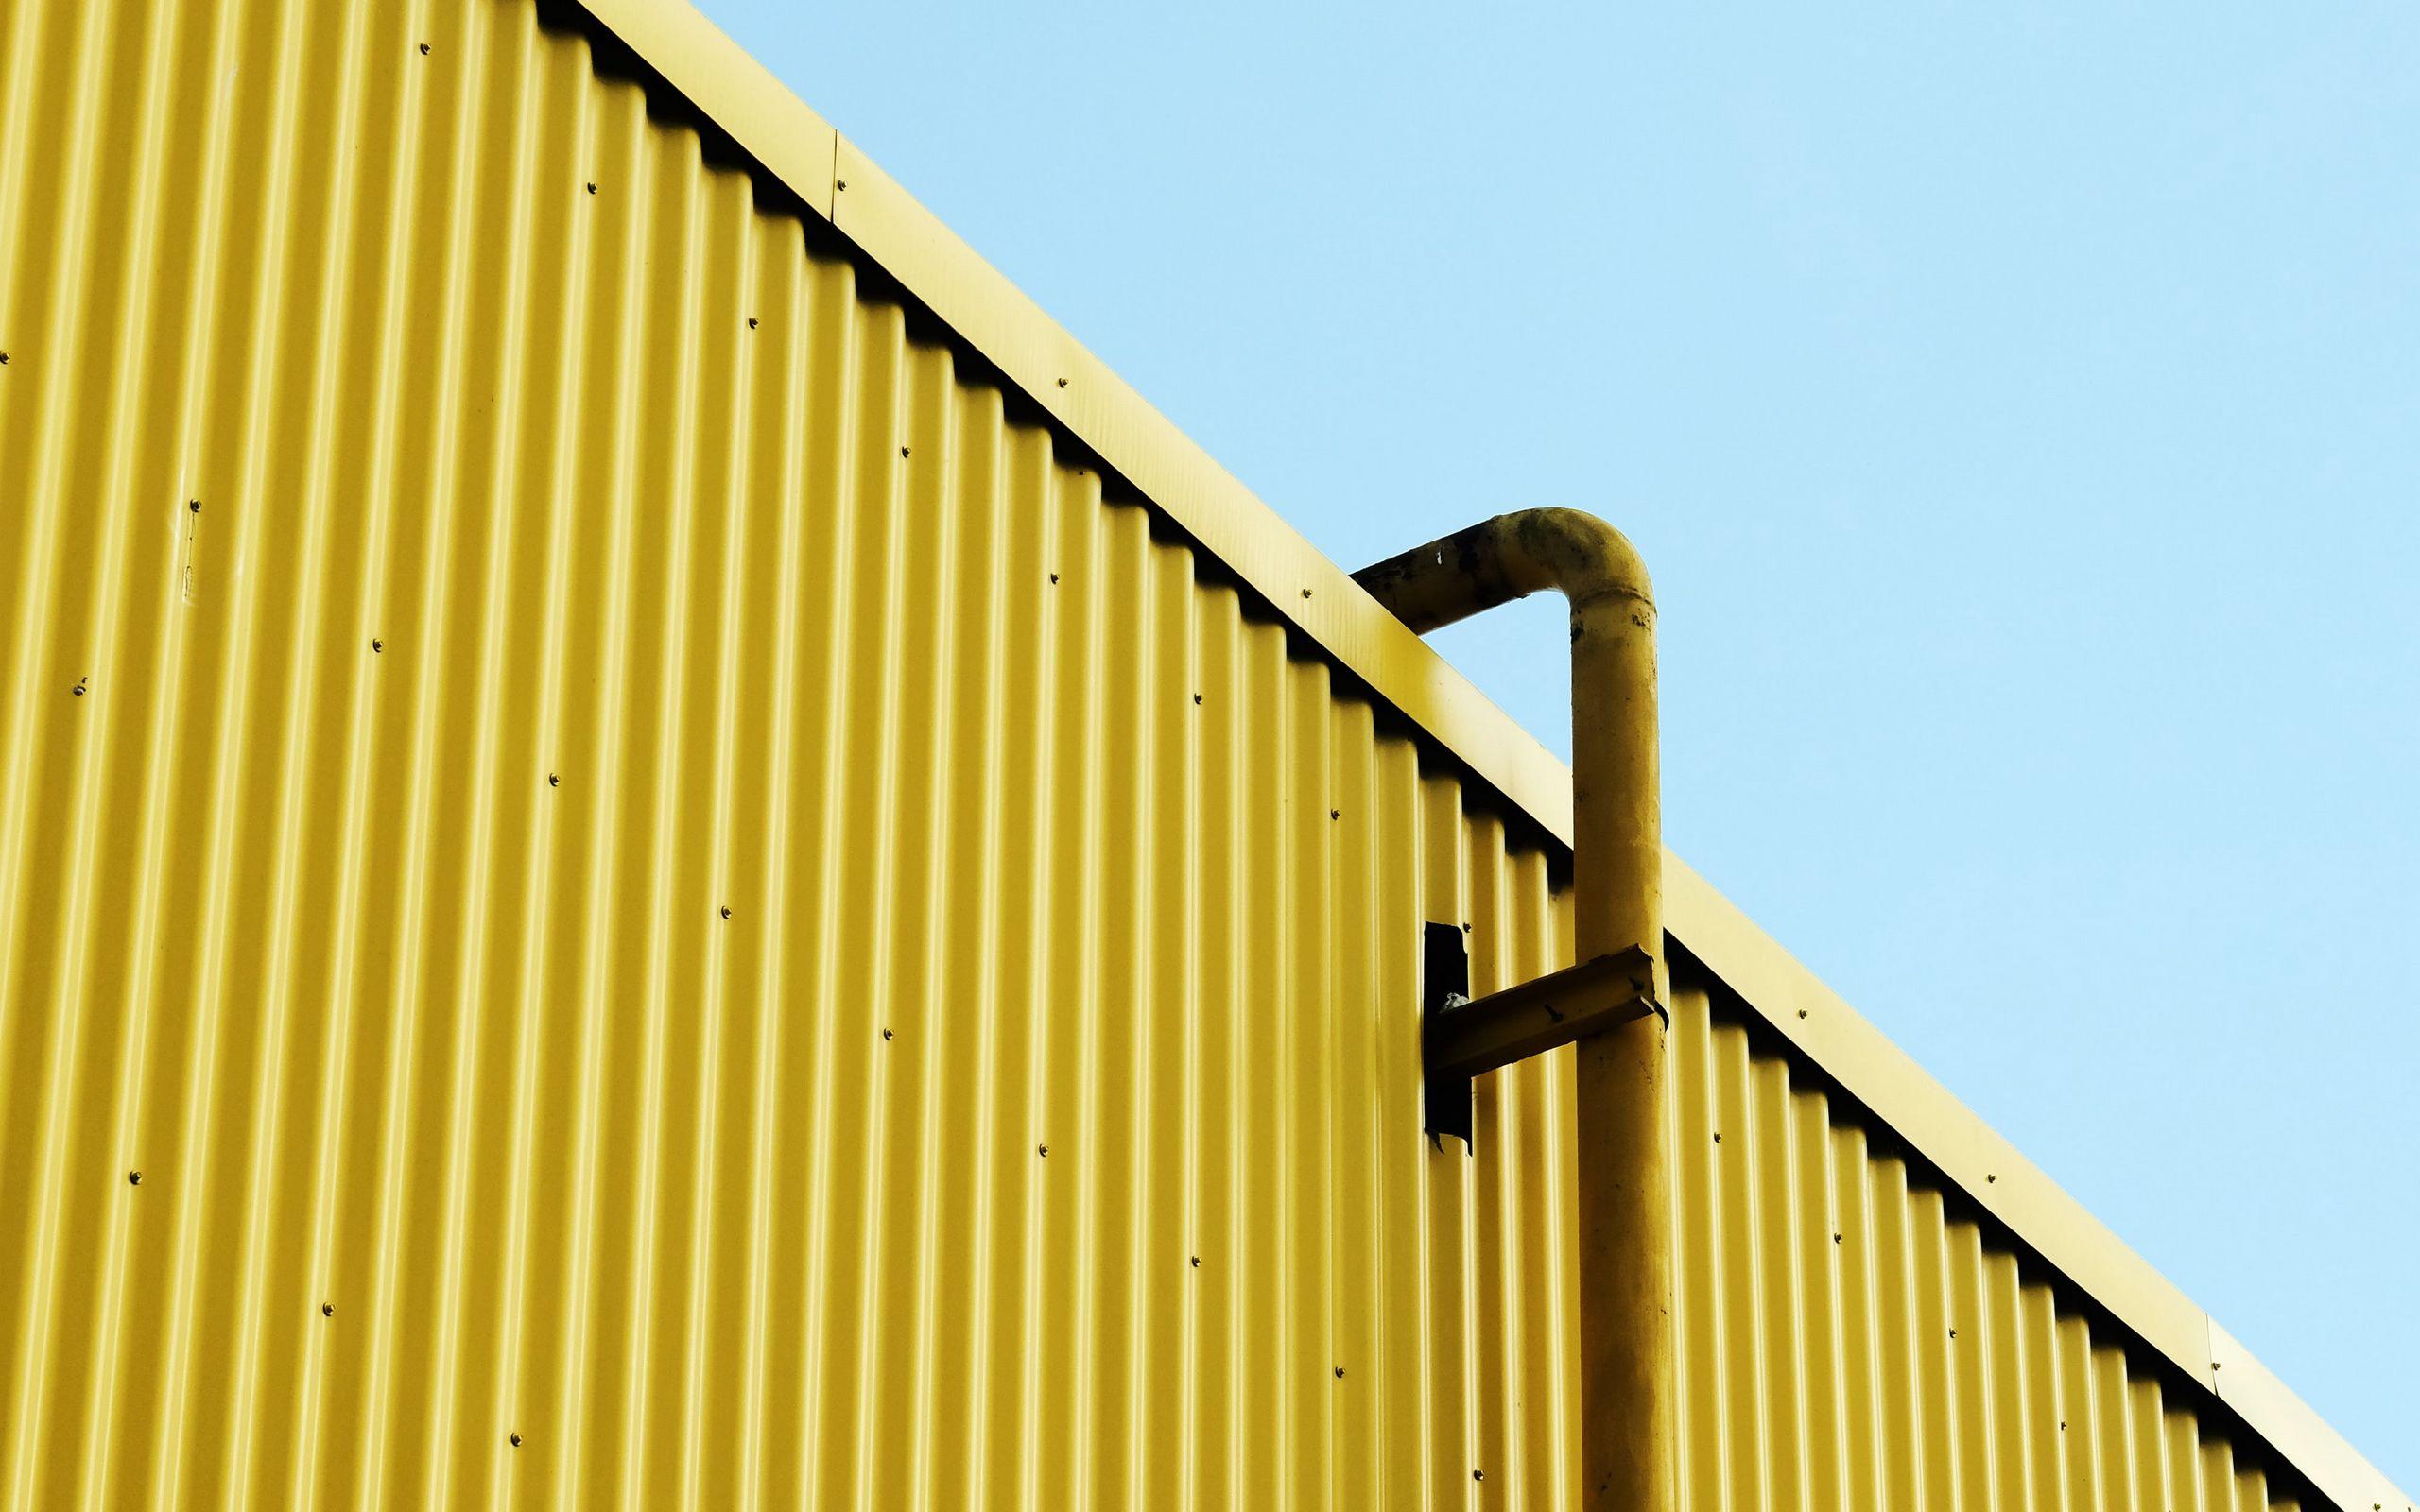 2560x1600 Wallpaper building, pipe, yellow, minimalism